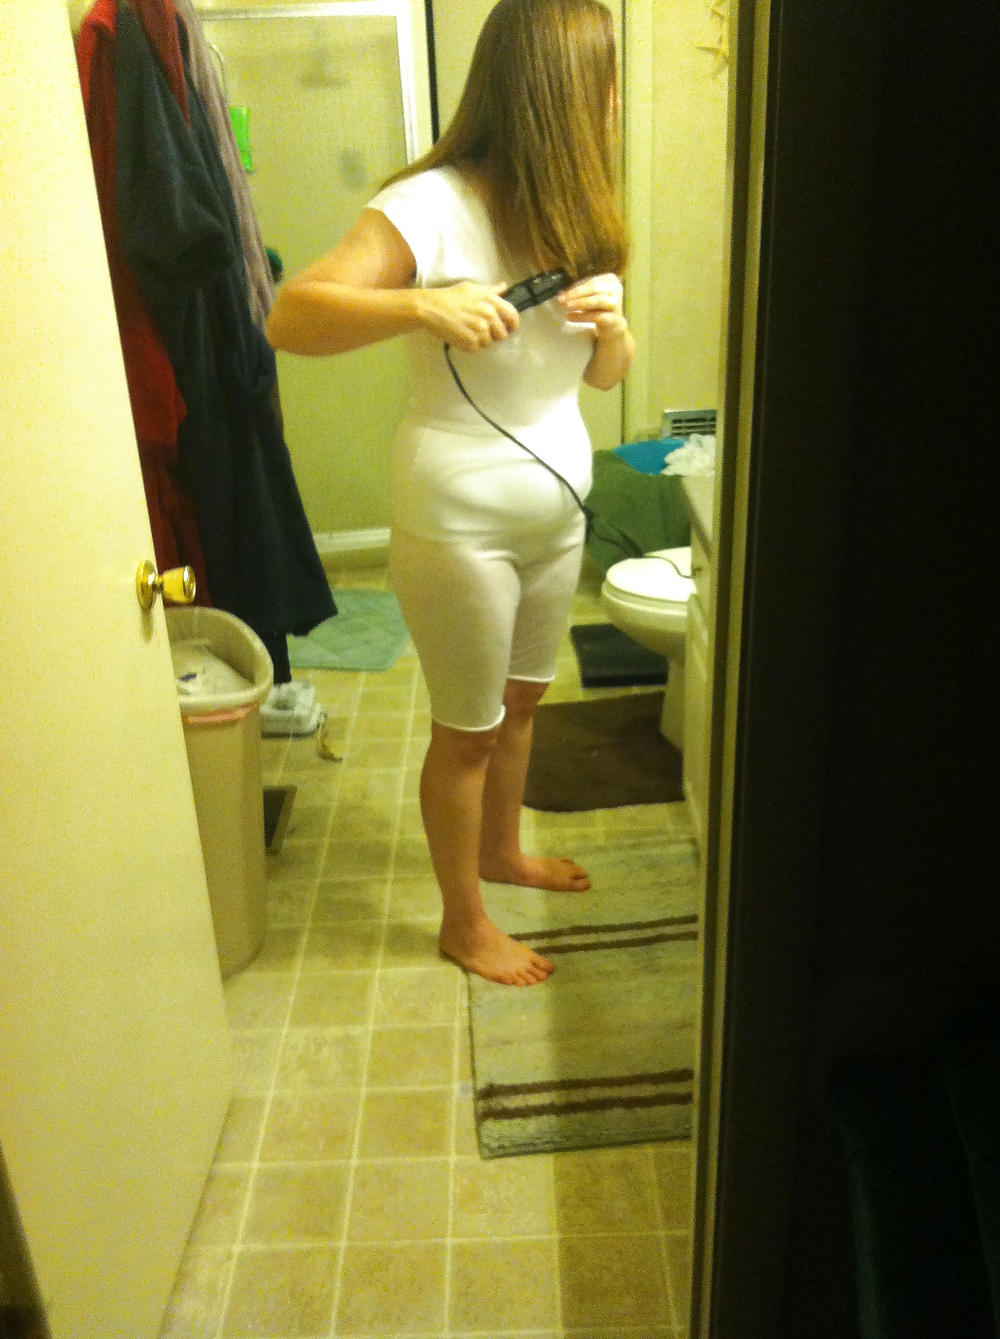 Naked mormon wife, bigfat naked teens